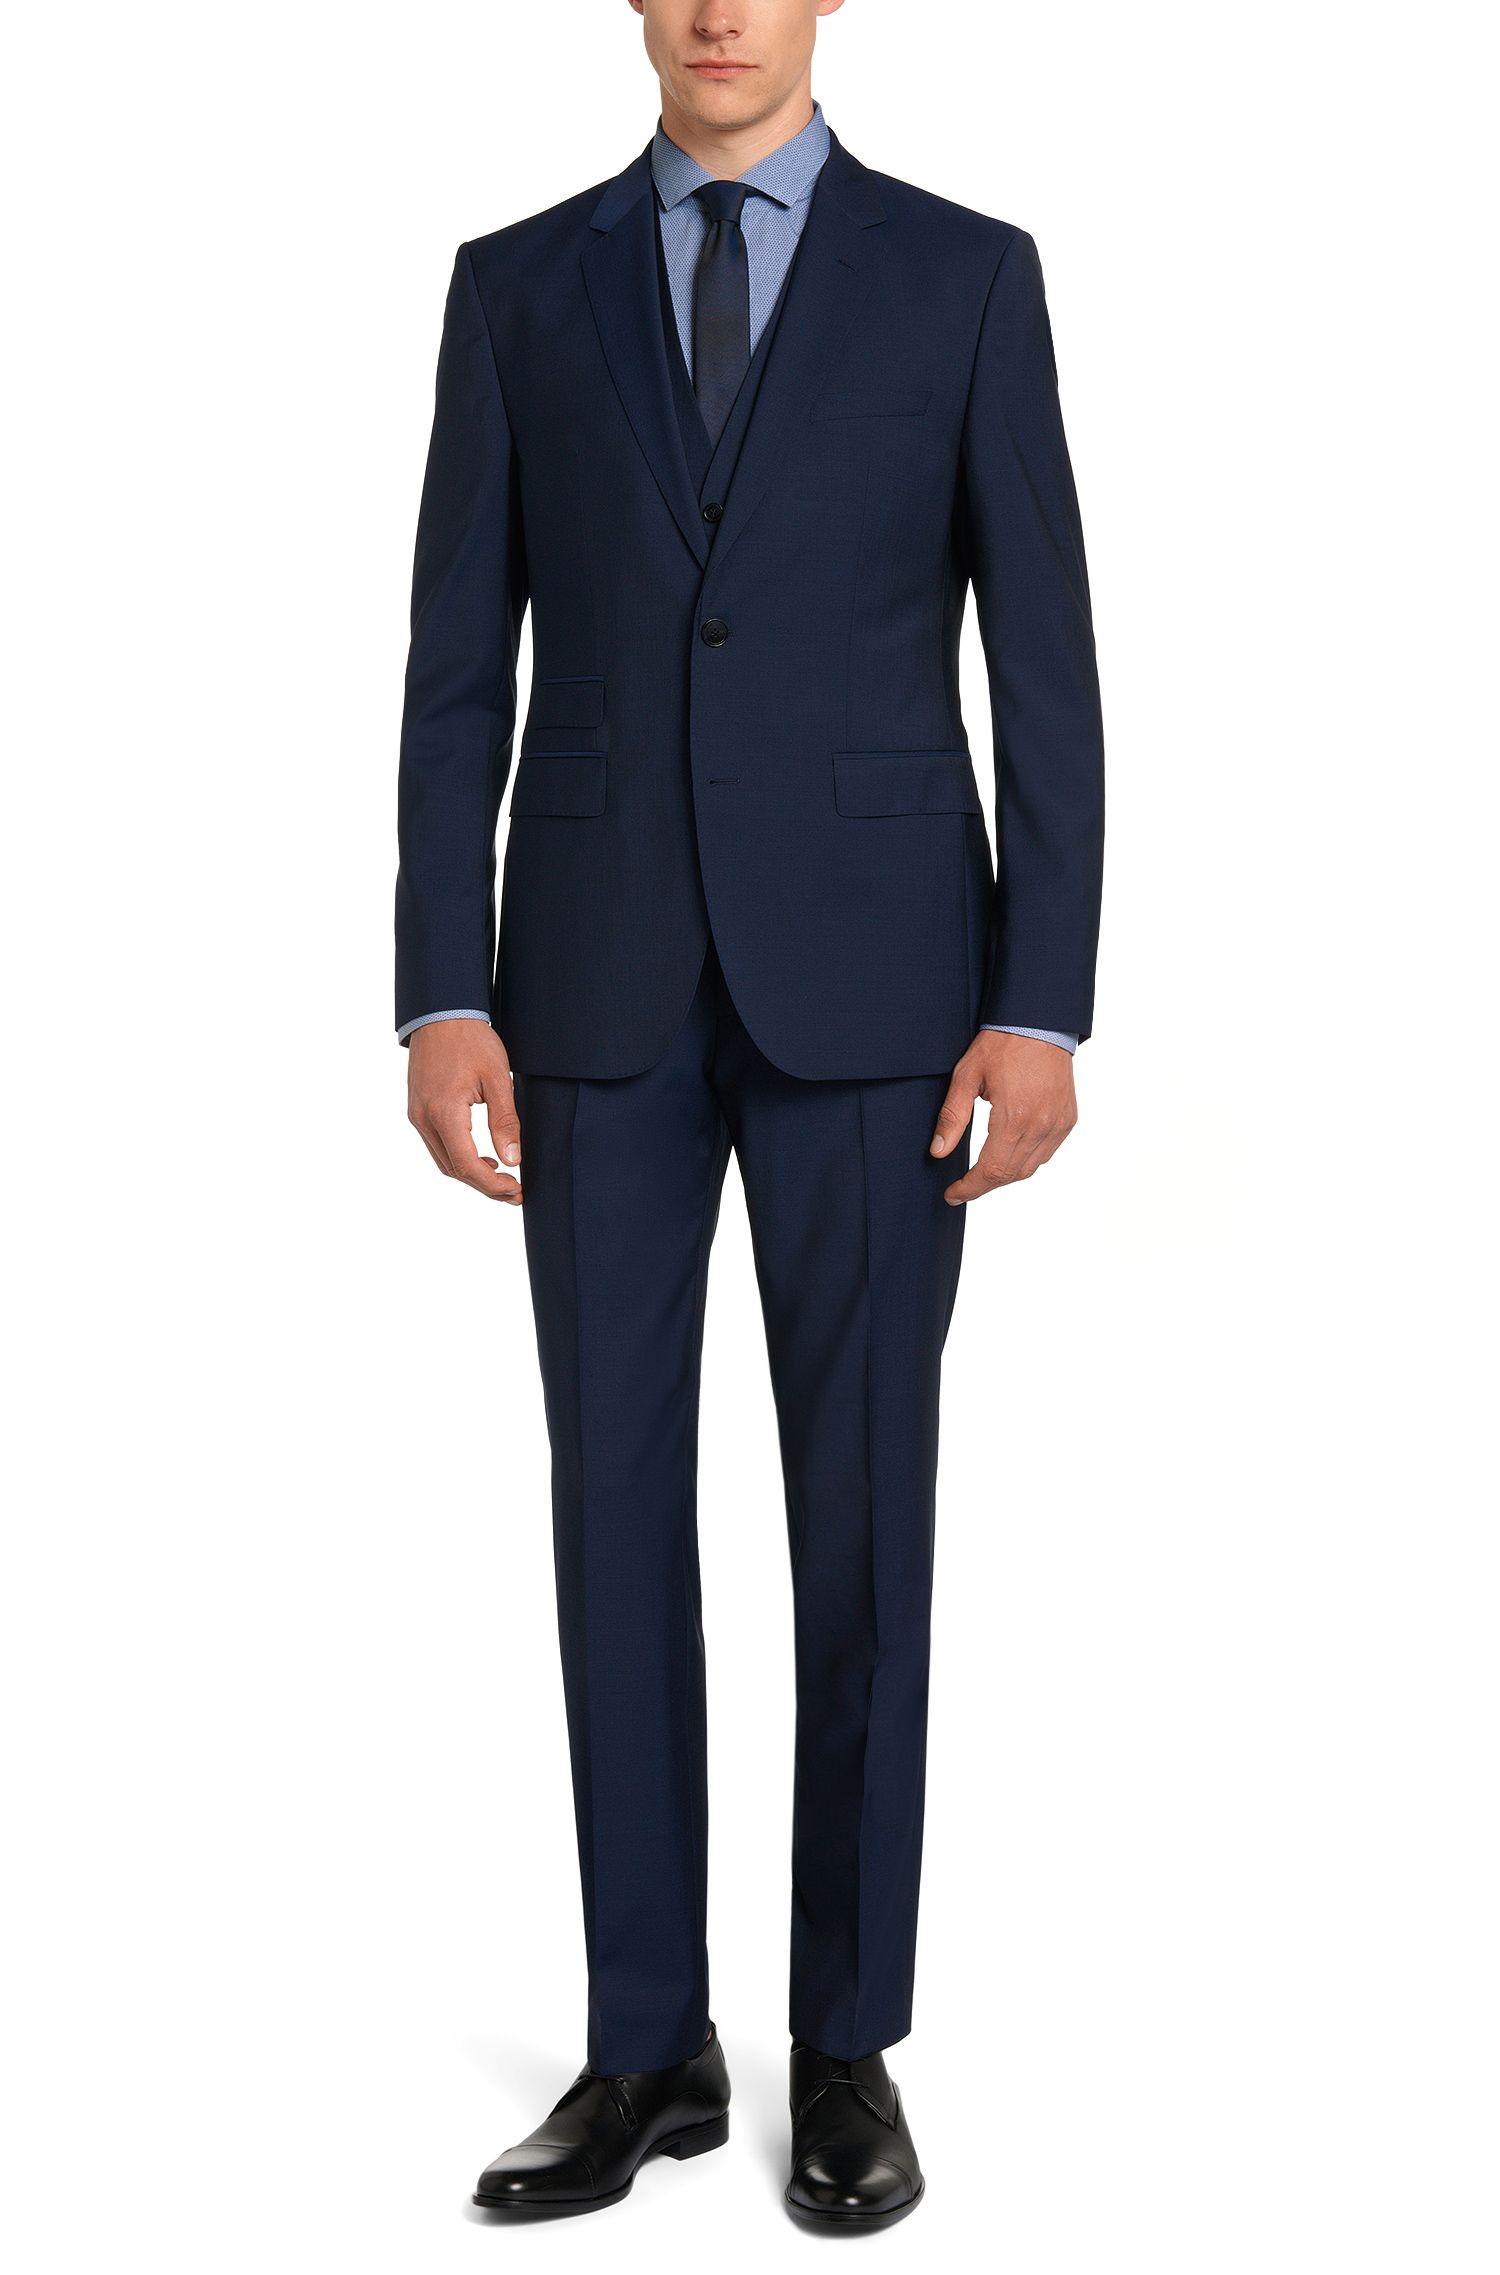 Gemustertes Slim-Fit Hemd aus reiner Baumwolle: 'Erondo'